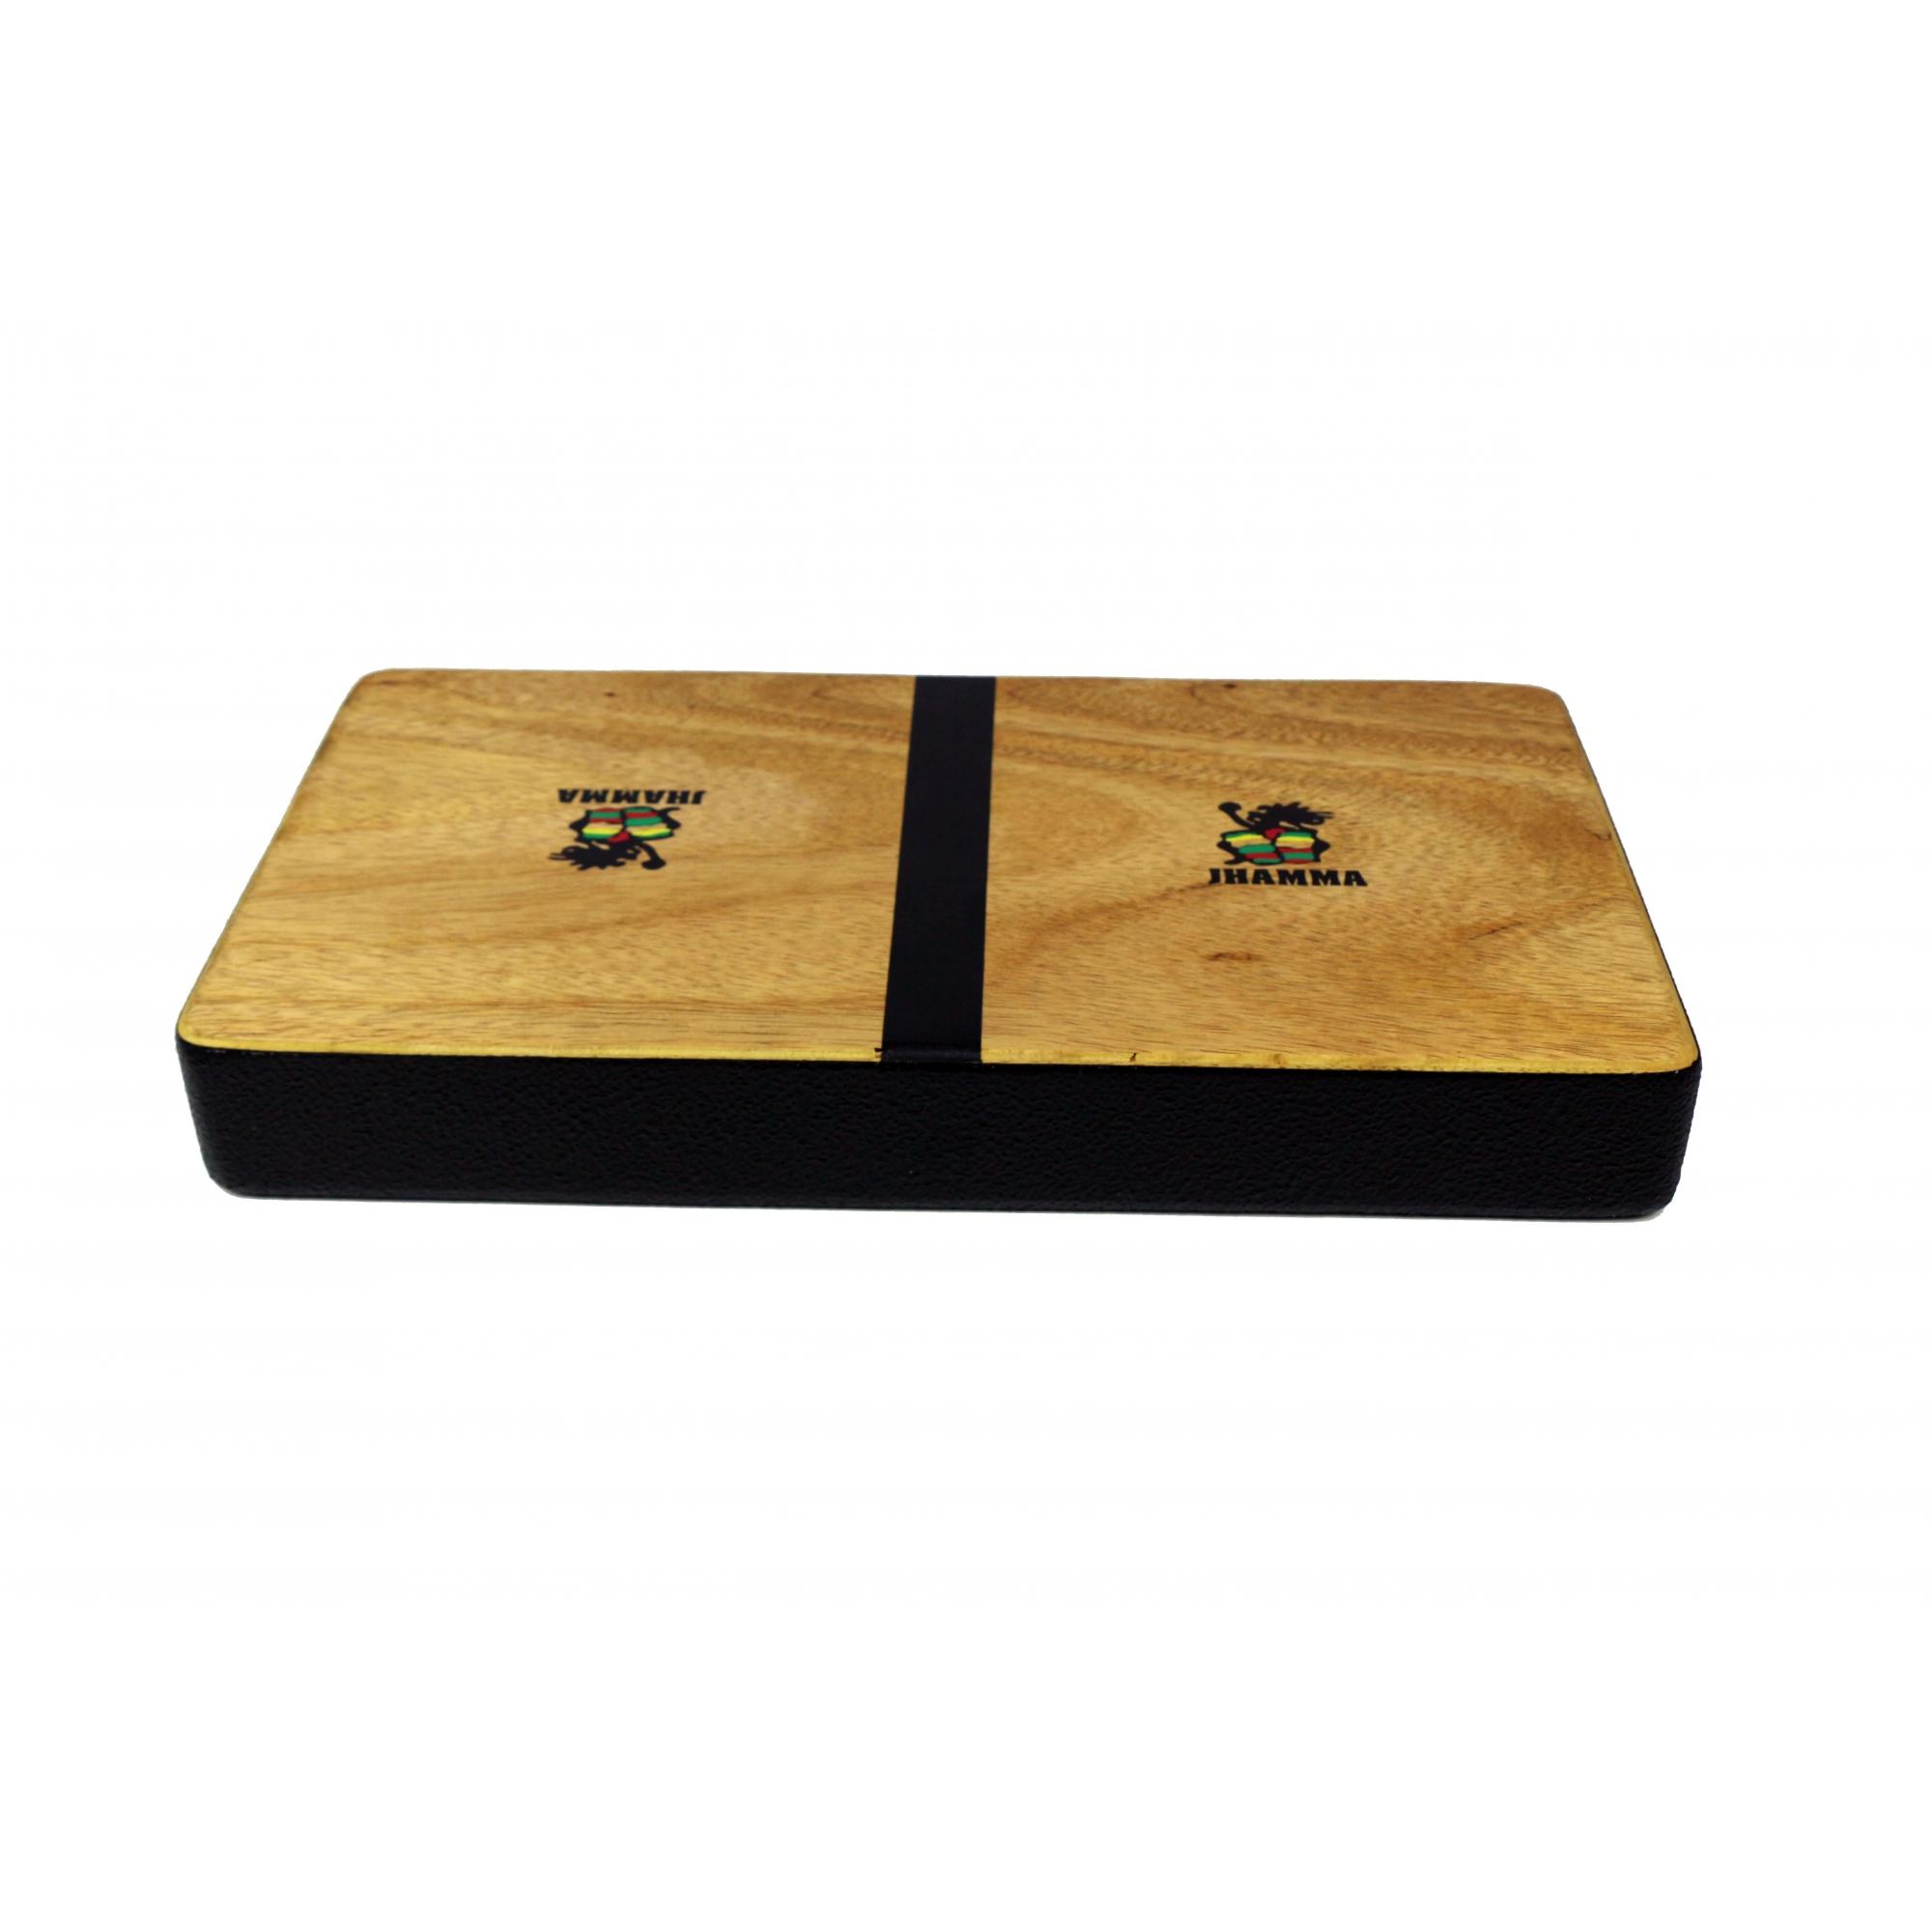 Conga Compacta + Bag Jhamma Percussões Conga de Colo